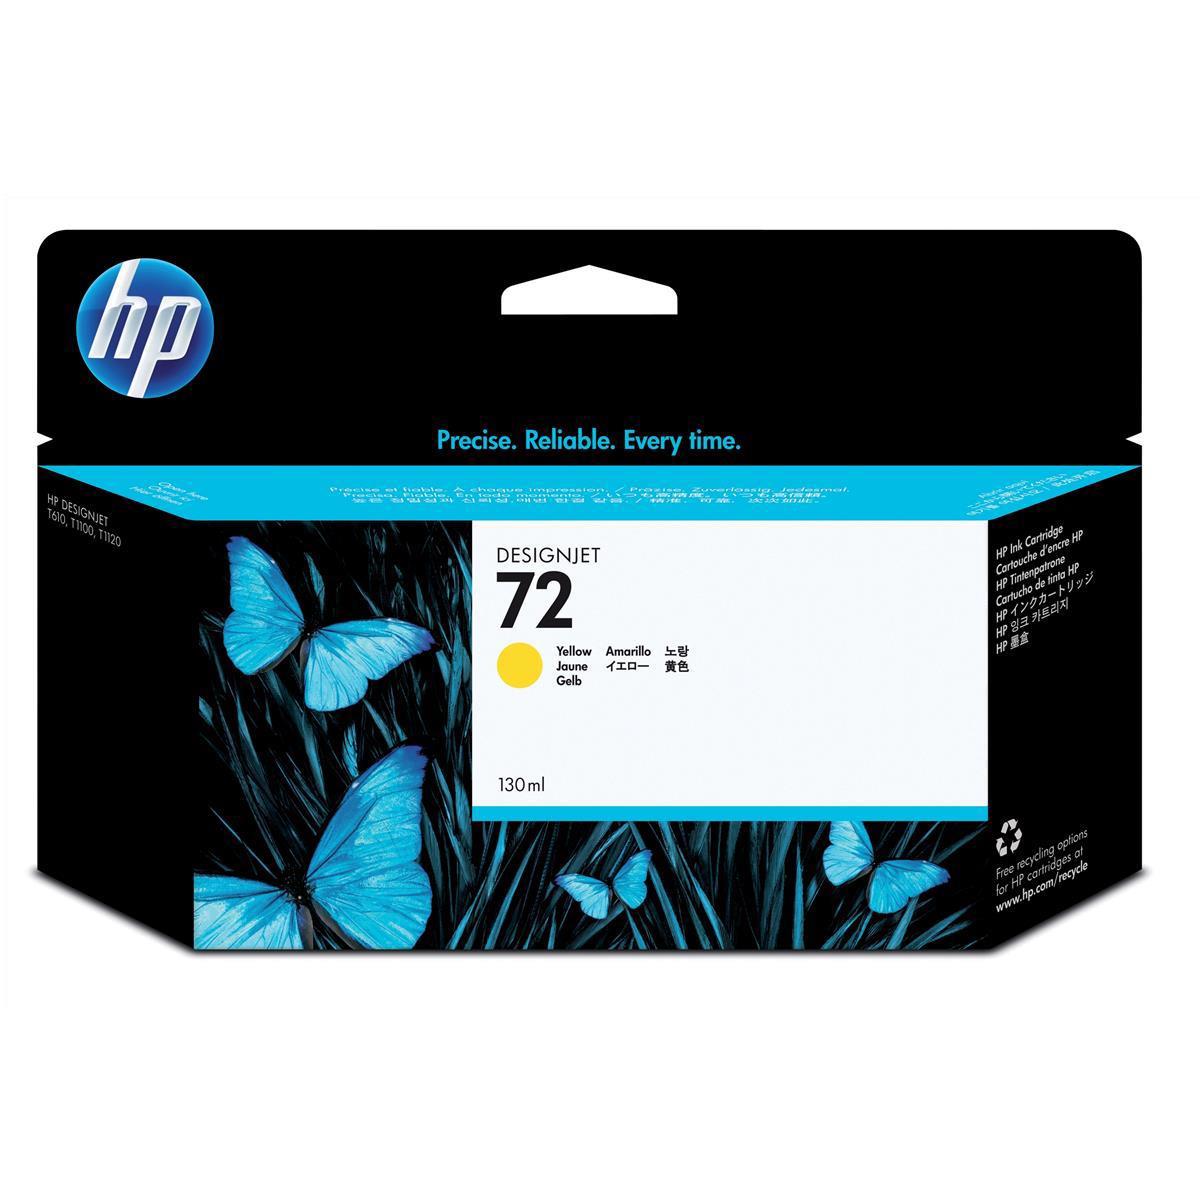 Hewlett Packard [HP] No.72 Inkjet Cartridge High Yield 130ml Yellow Ref C9373A